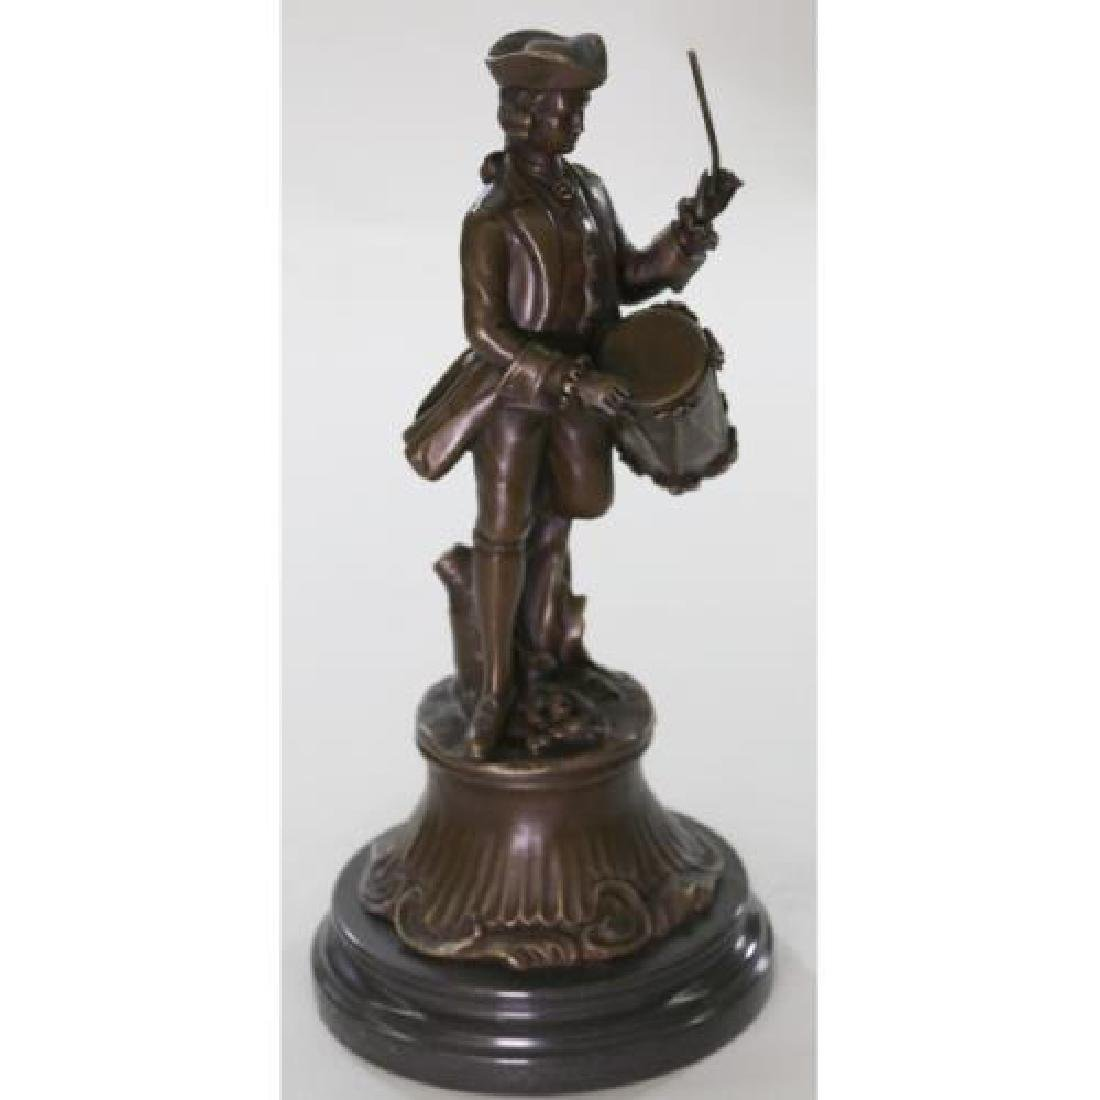 American Civil War Drummer Bronze Figurine